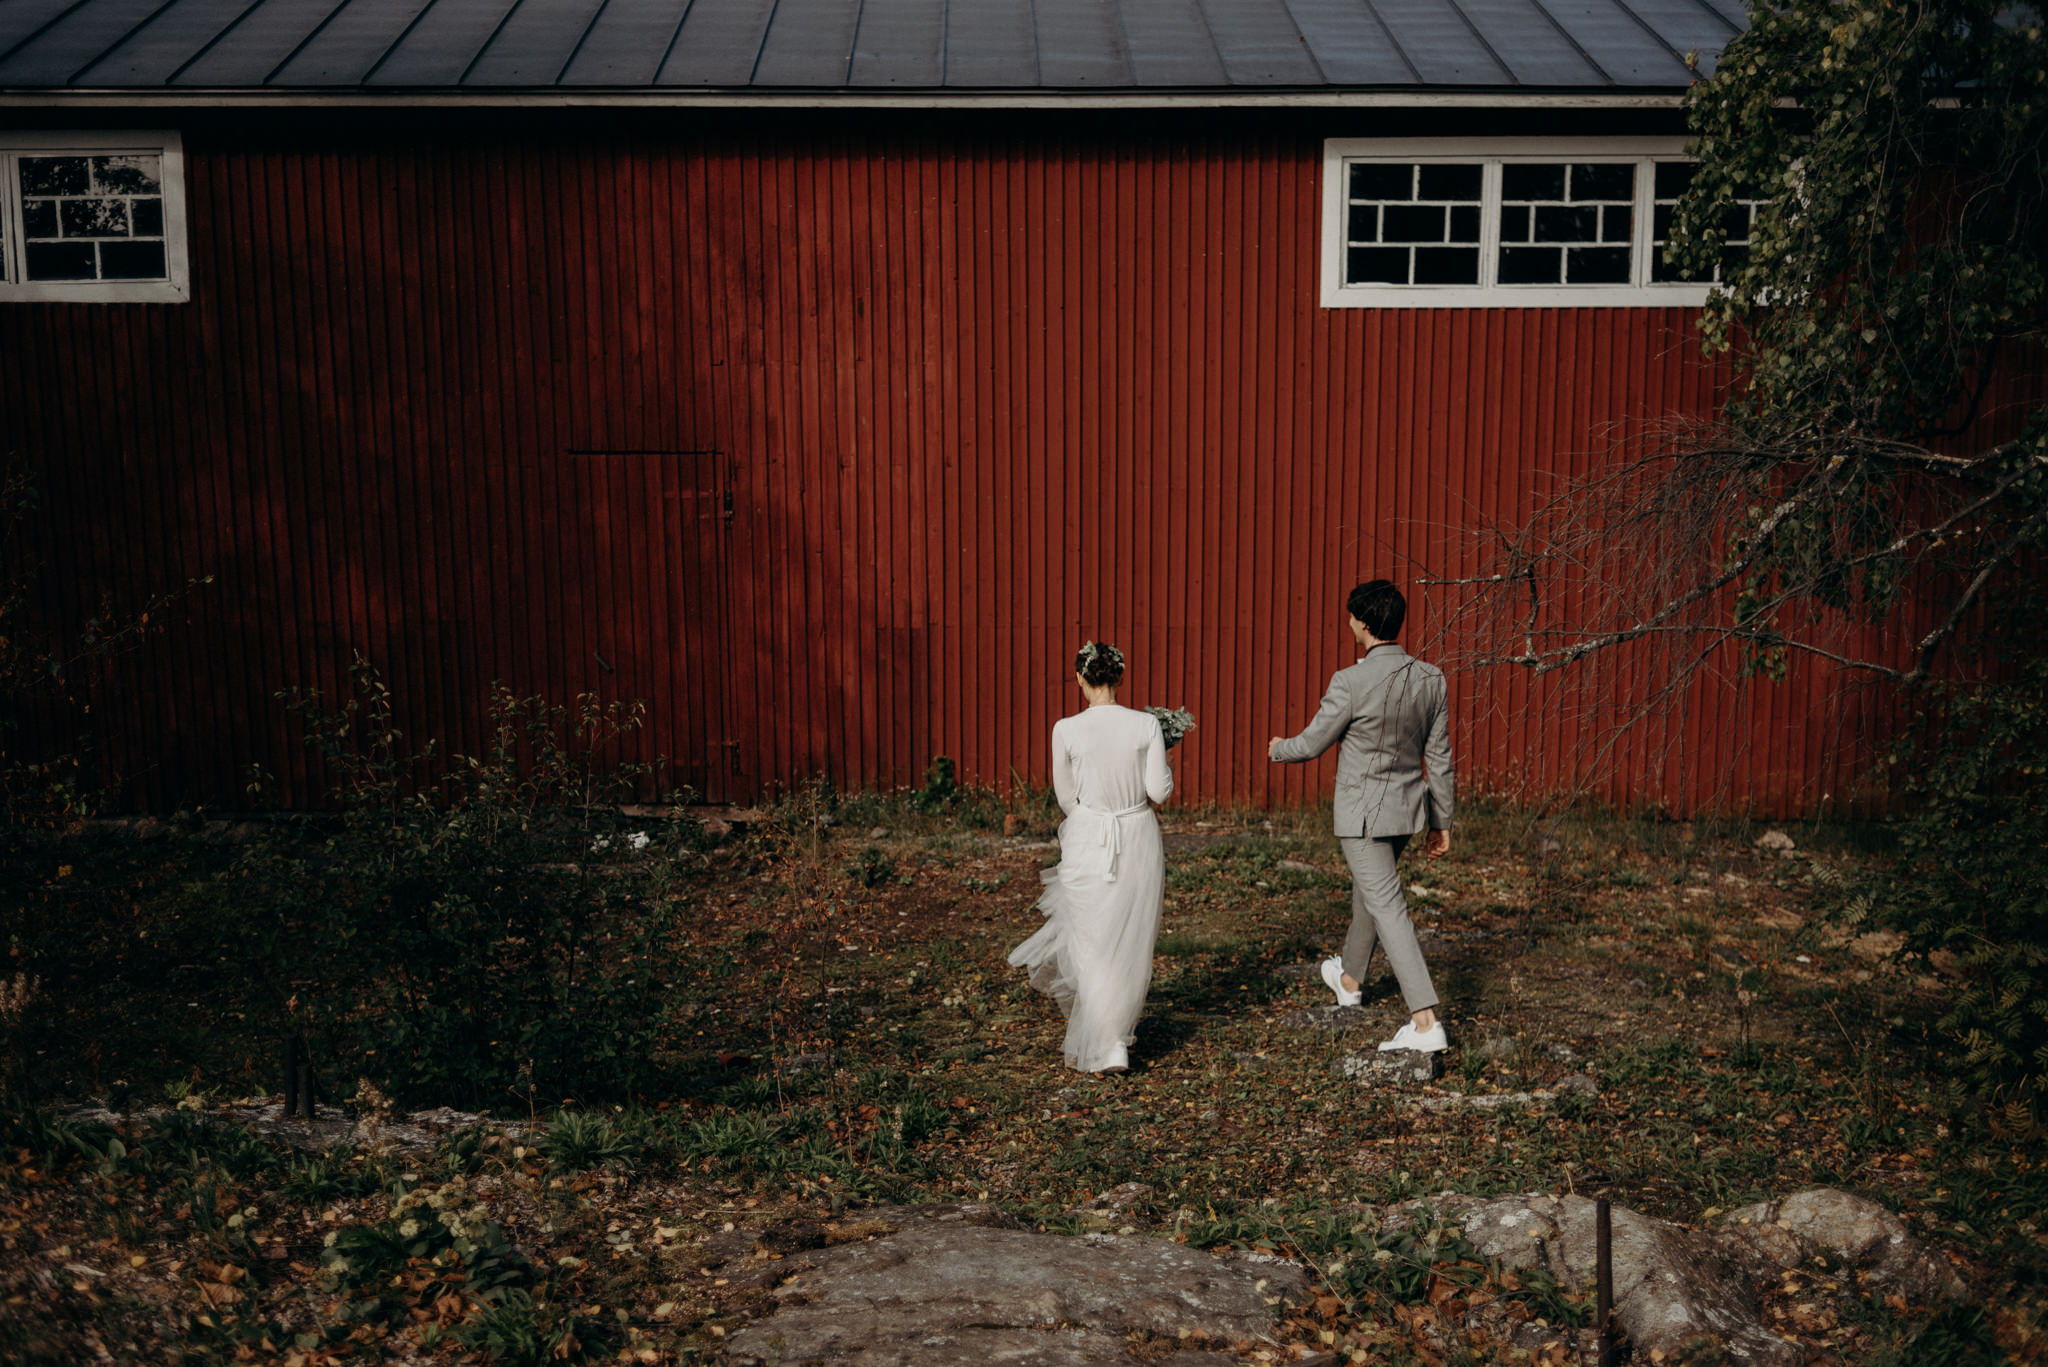 Bride and groom walking towards boathouse for portraits, Valkosaaren Telakka wedding